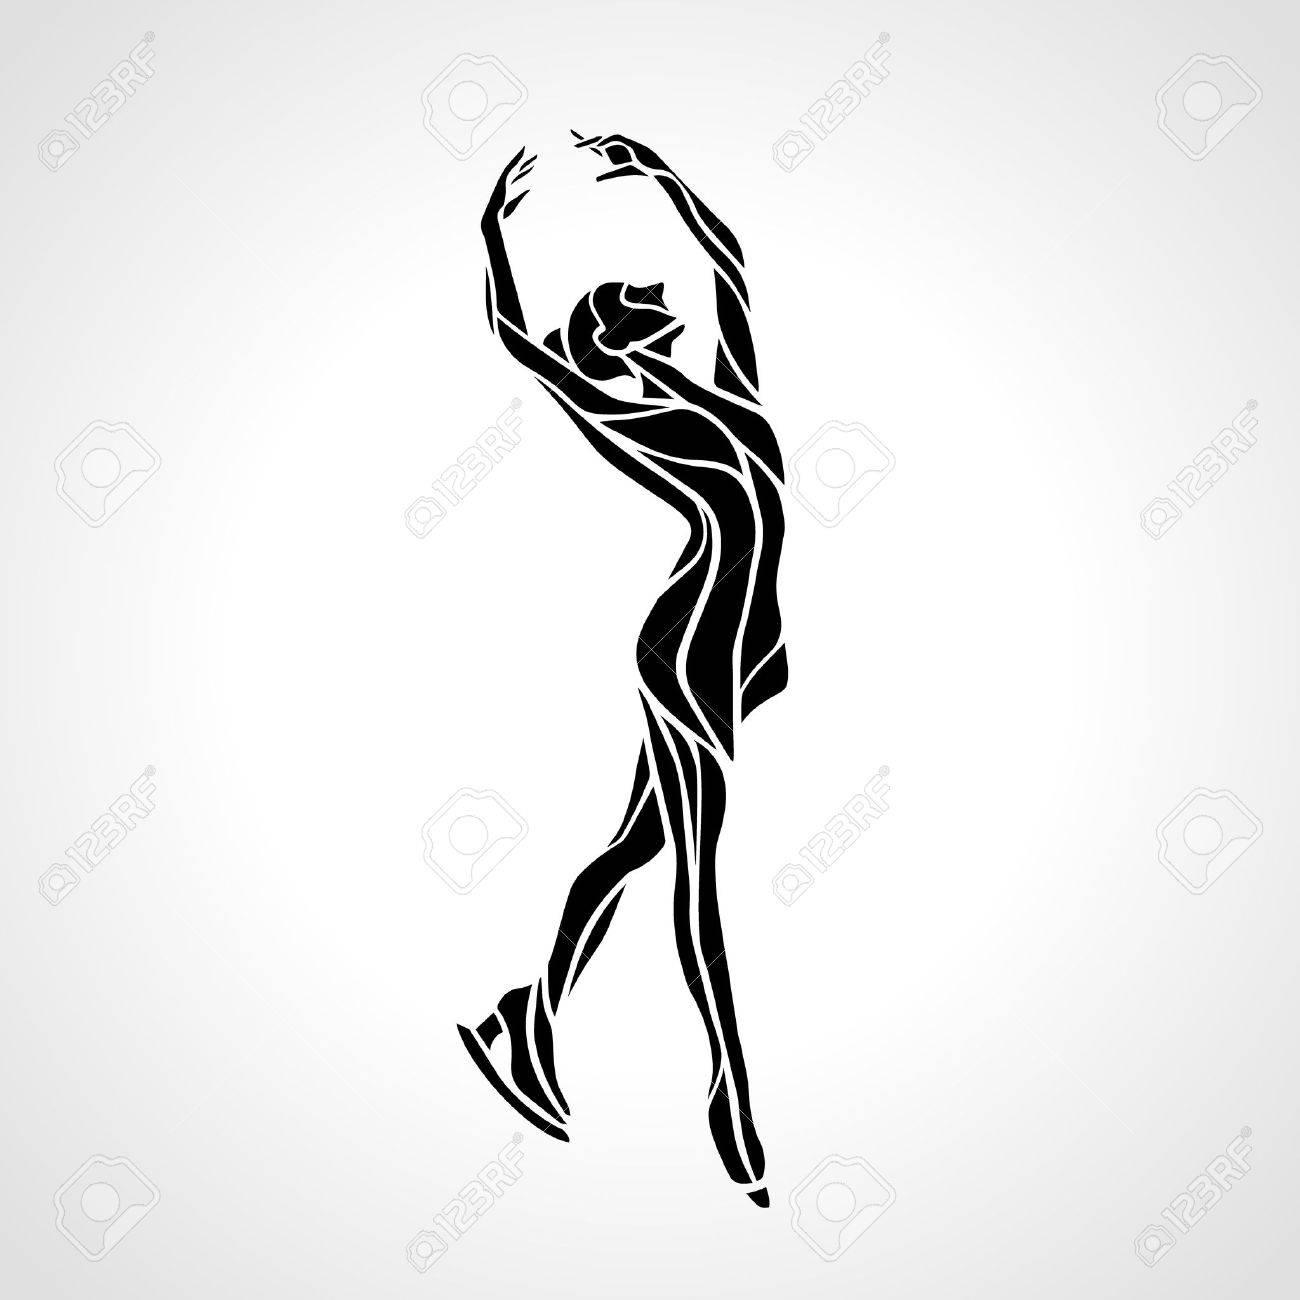 Winter sport. Ladies figure skating silhouette. Ice show. - 50093210